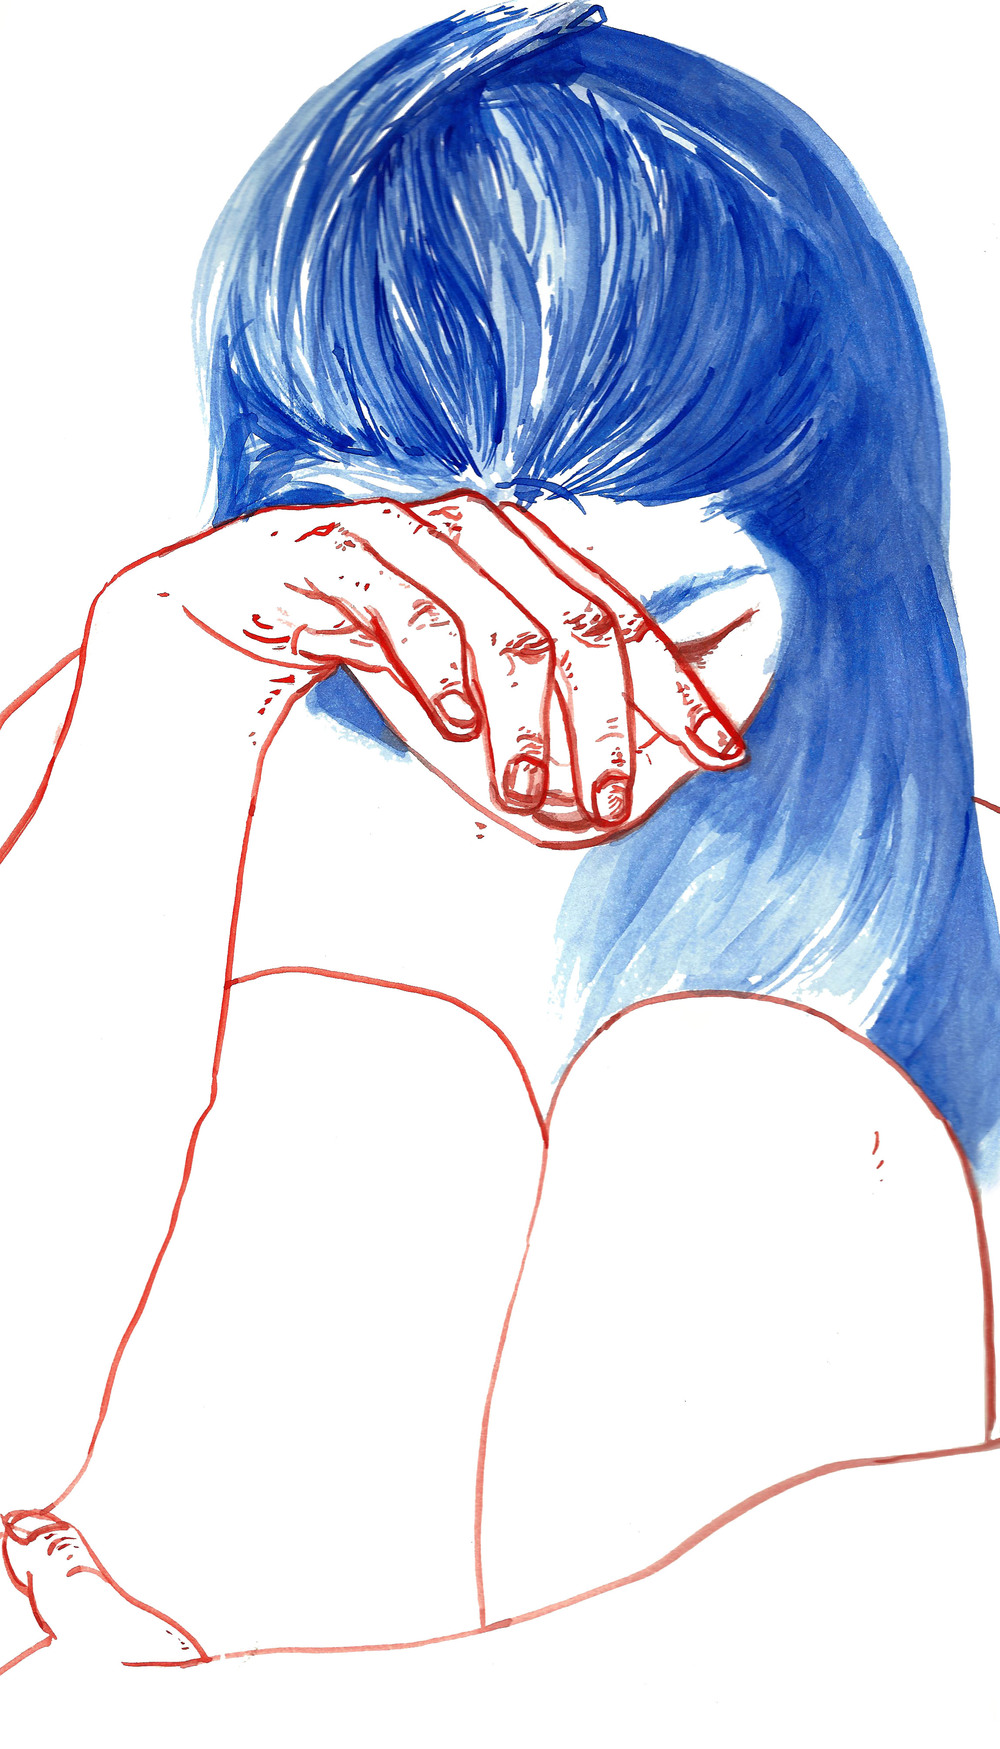 Illustration by Vivian Shih.